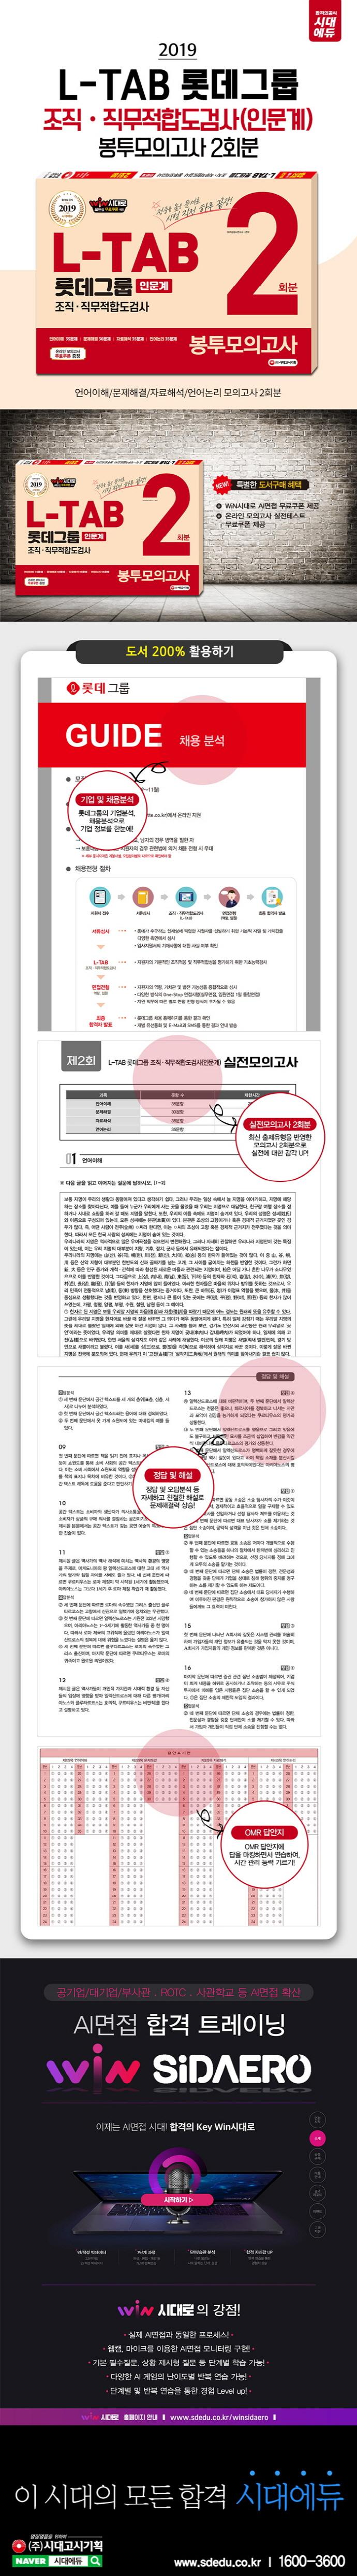 L-TAB 롯데그룹 조직 직무적합도검사(인문계) 봉투모의고사 2회분(2019) 도서 상세이미지